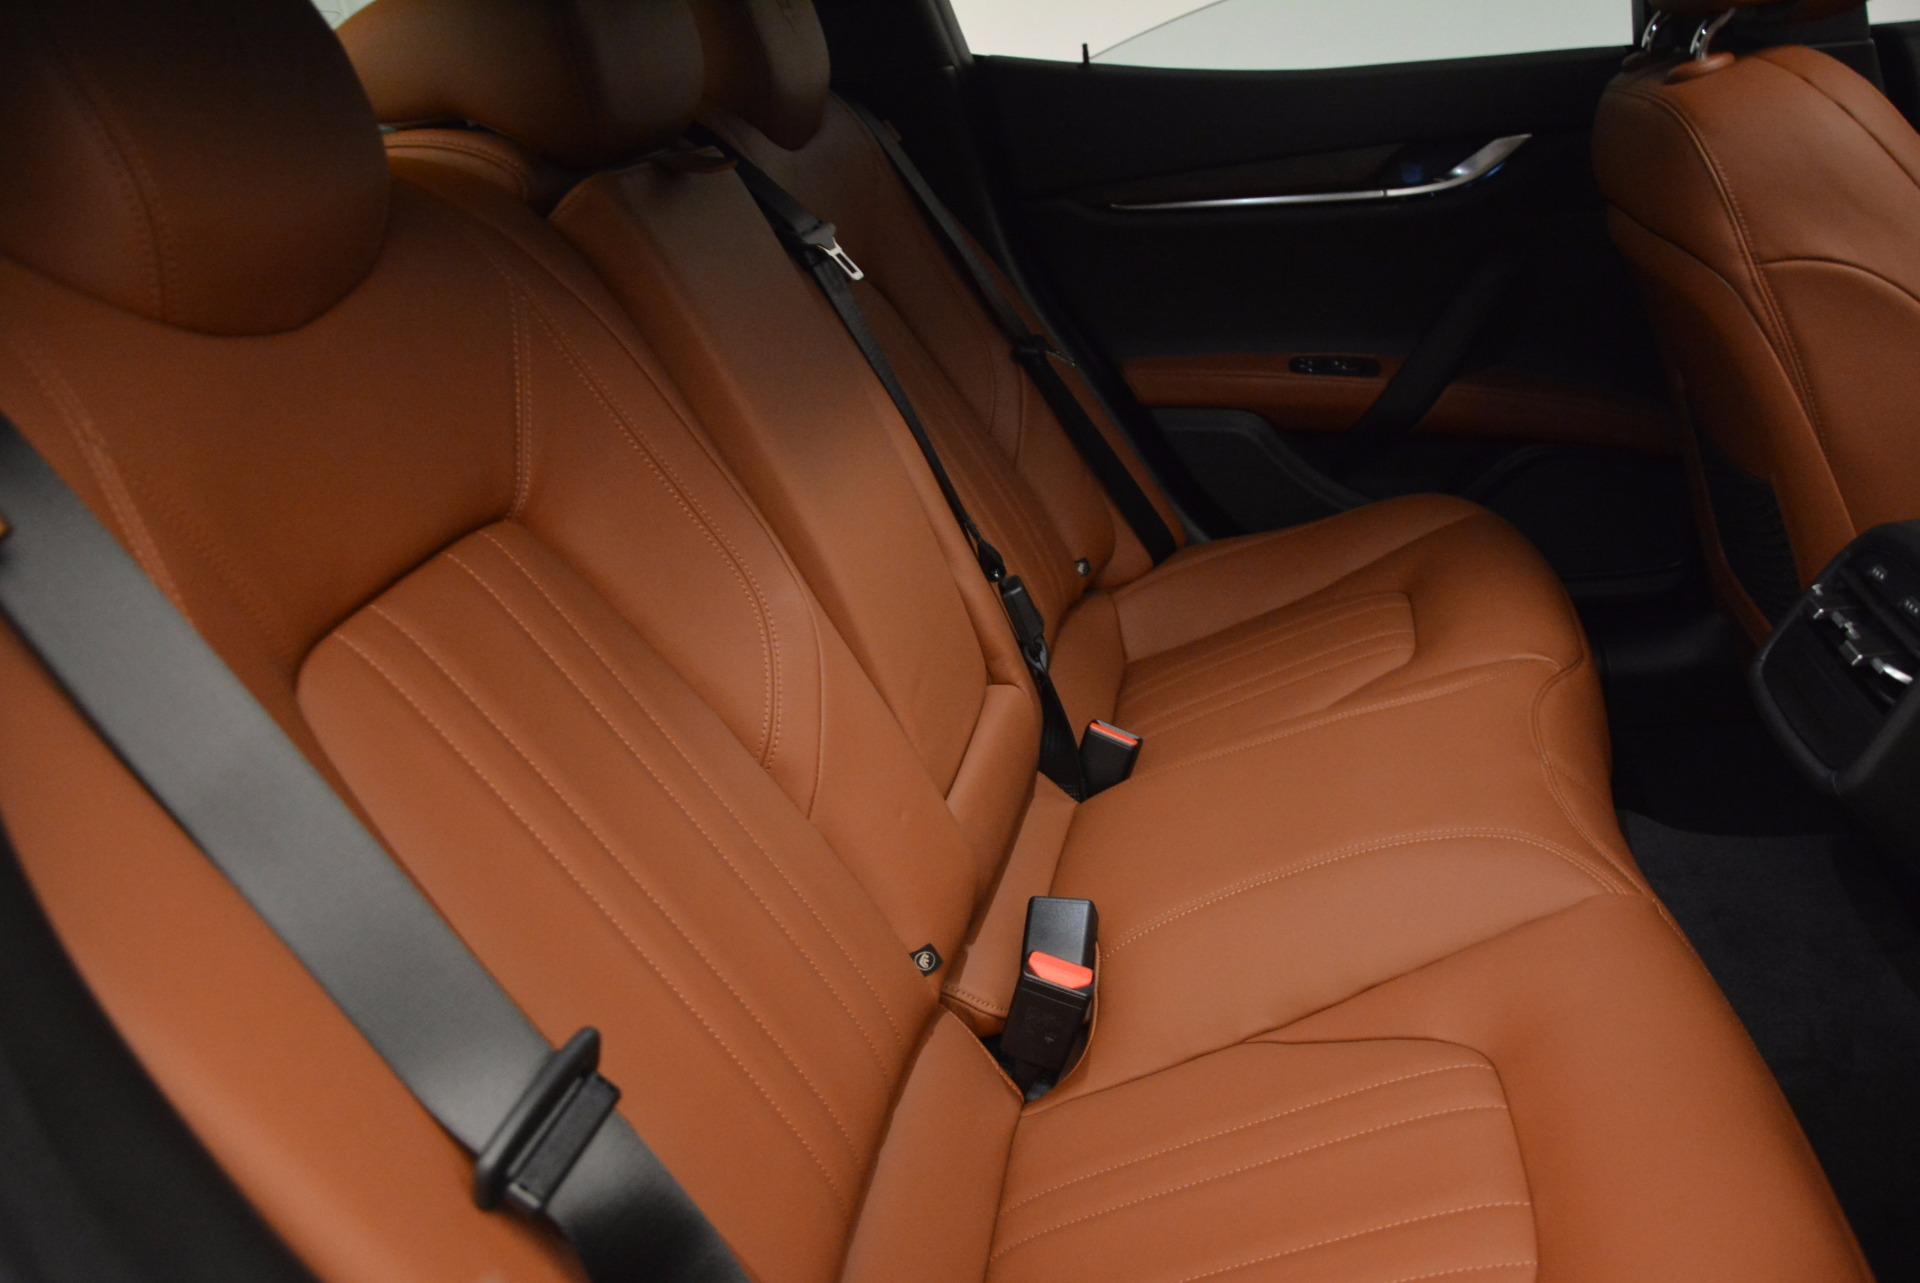 New 2017 Maserati Ghibli S Q4 EX-Loaner For Sale In Greenwich, CT 1018_p17